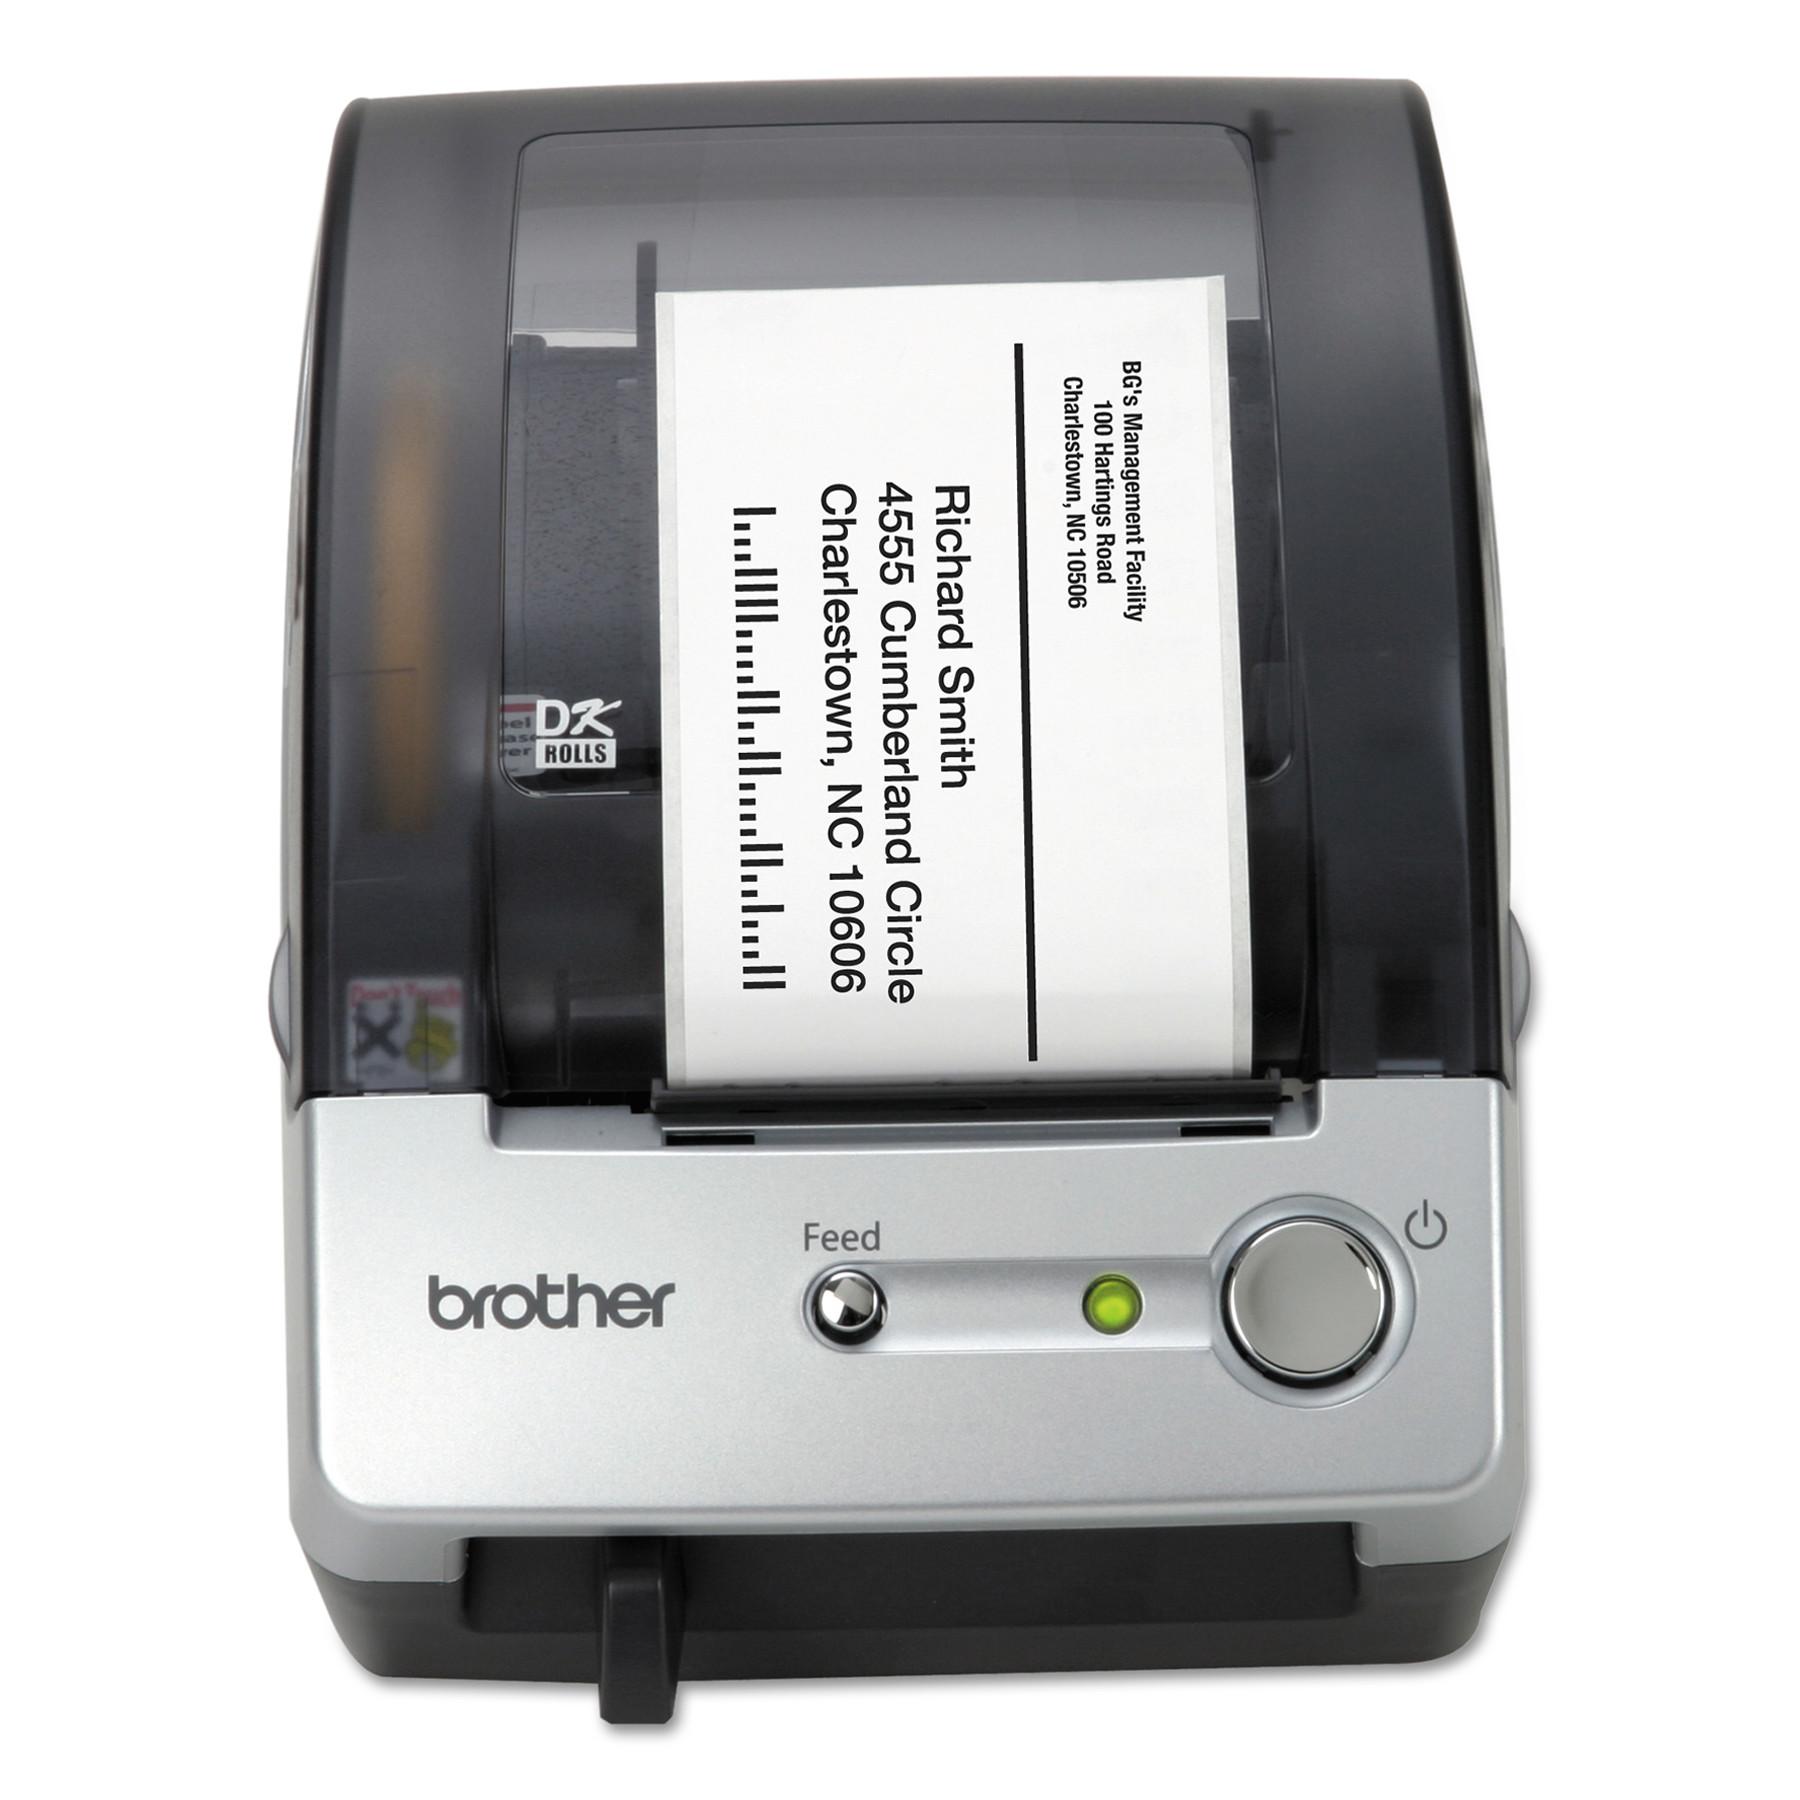 "Brother QL-500 Affordable Label Printer, 50 Labels/Min, 5-7/10""w x 6""d x 7-4/5""h"